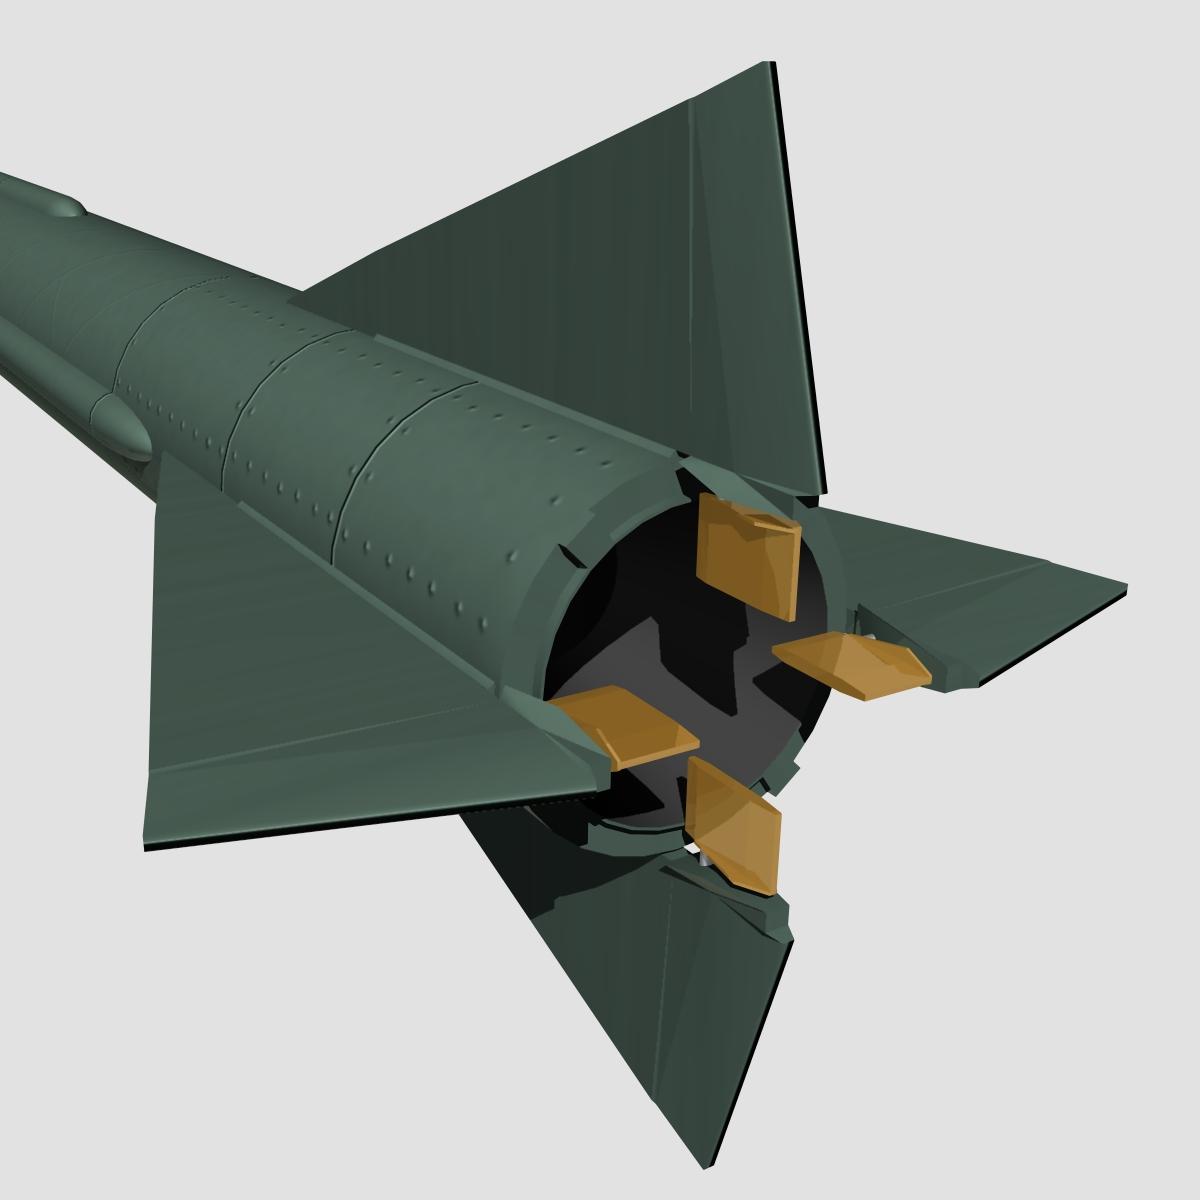 us mgm-5 corporal missile 3d model 3ds dxf x cod scn obj 149917